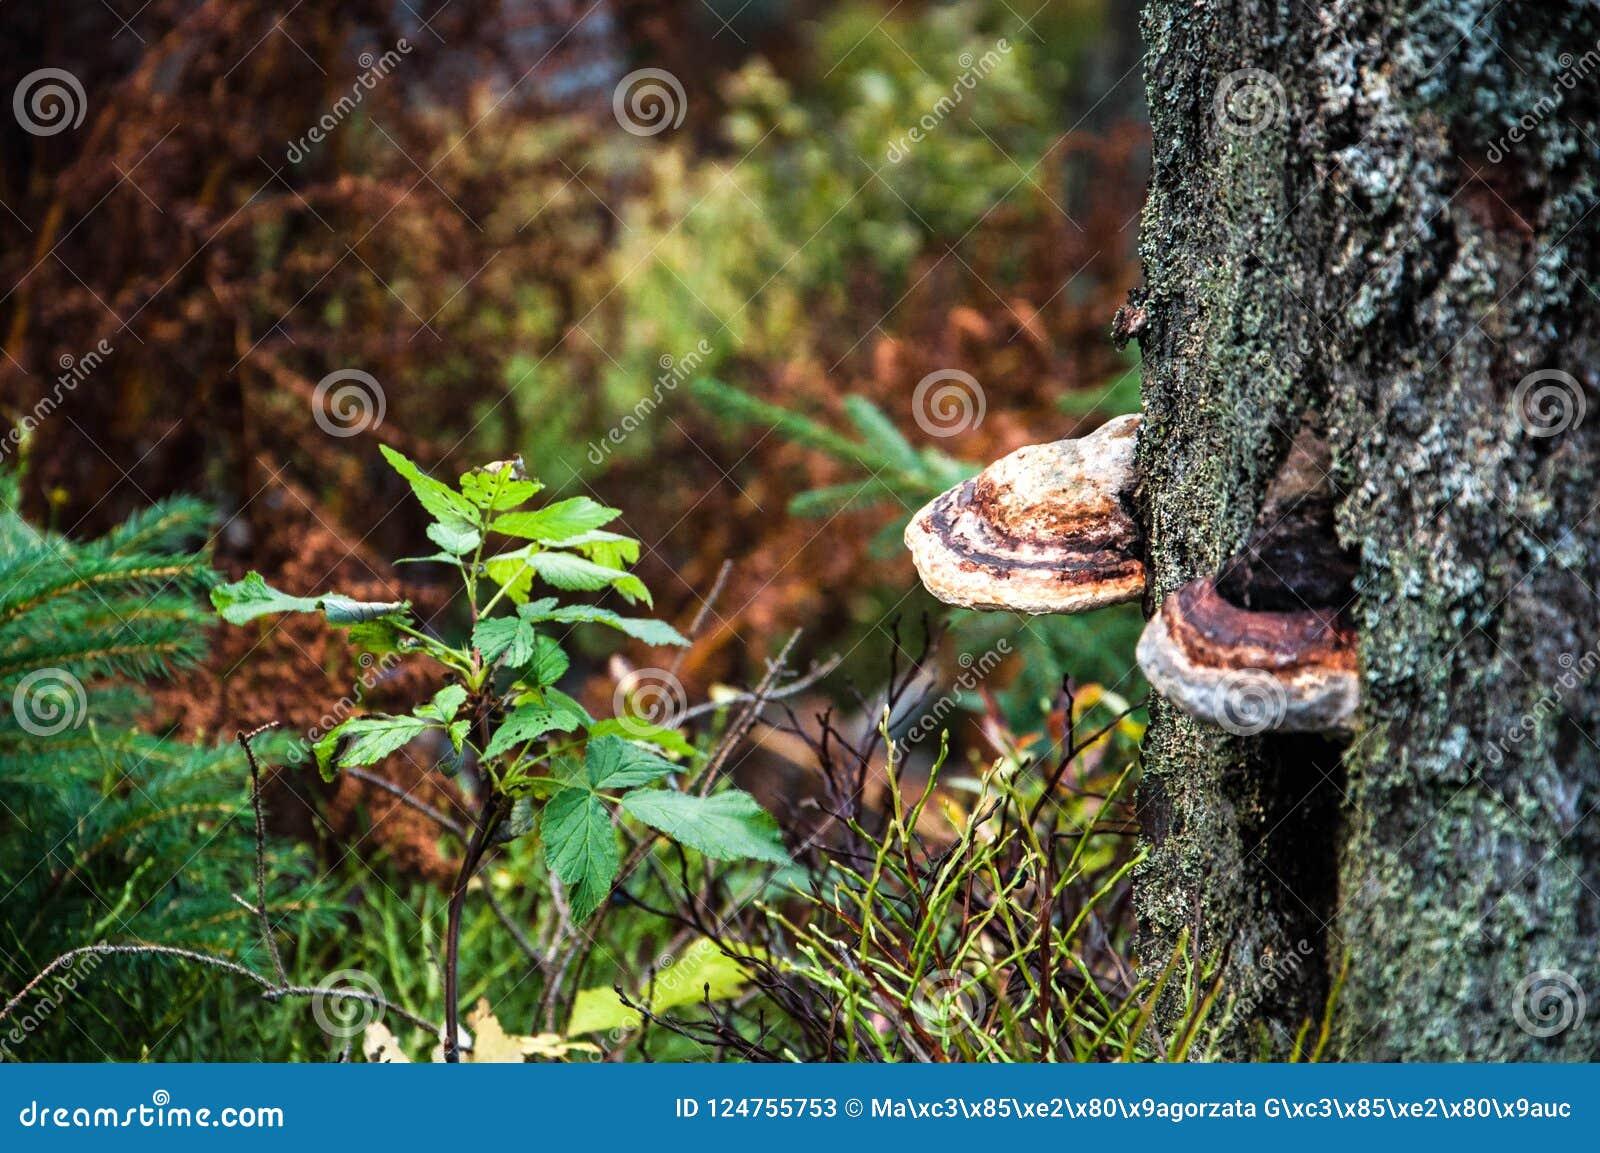 Hubs die op een boom groeien